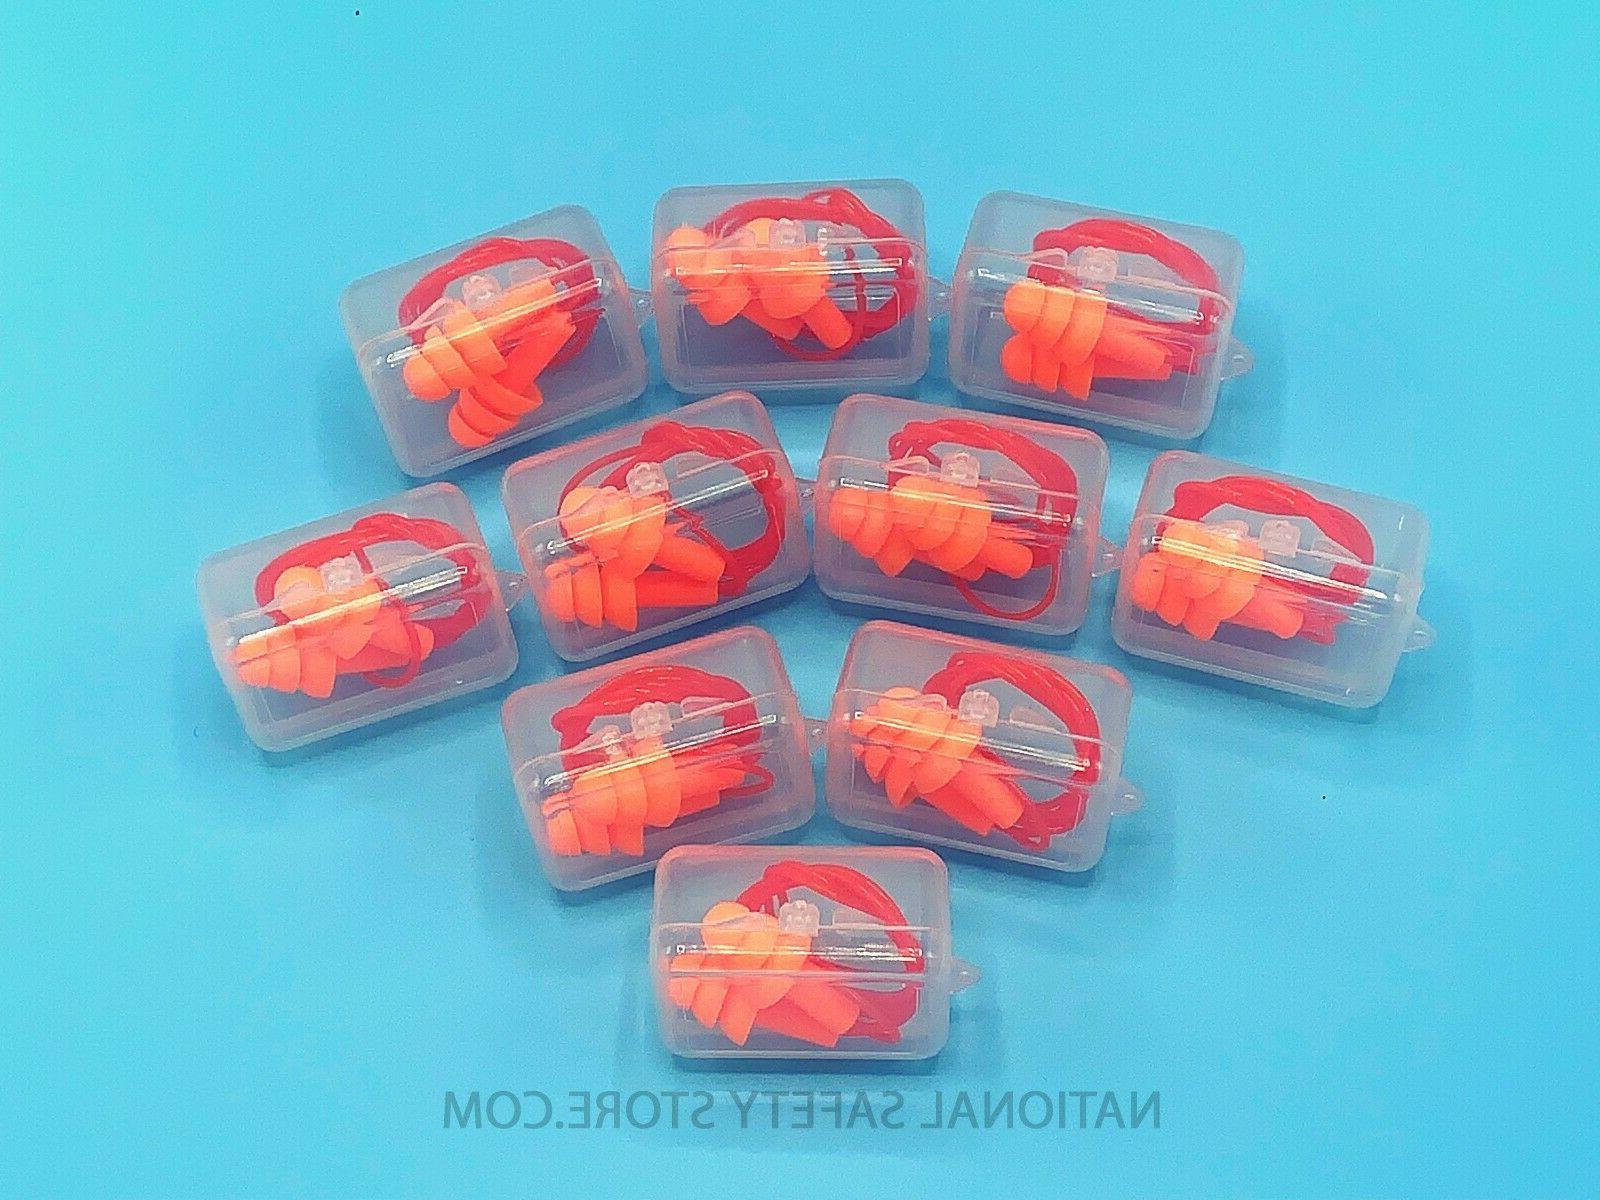 Ear 10 Orange Silicone Plugs 33dB Anti Protection